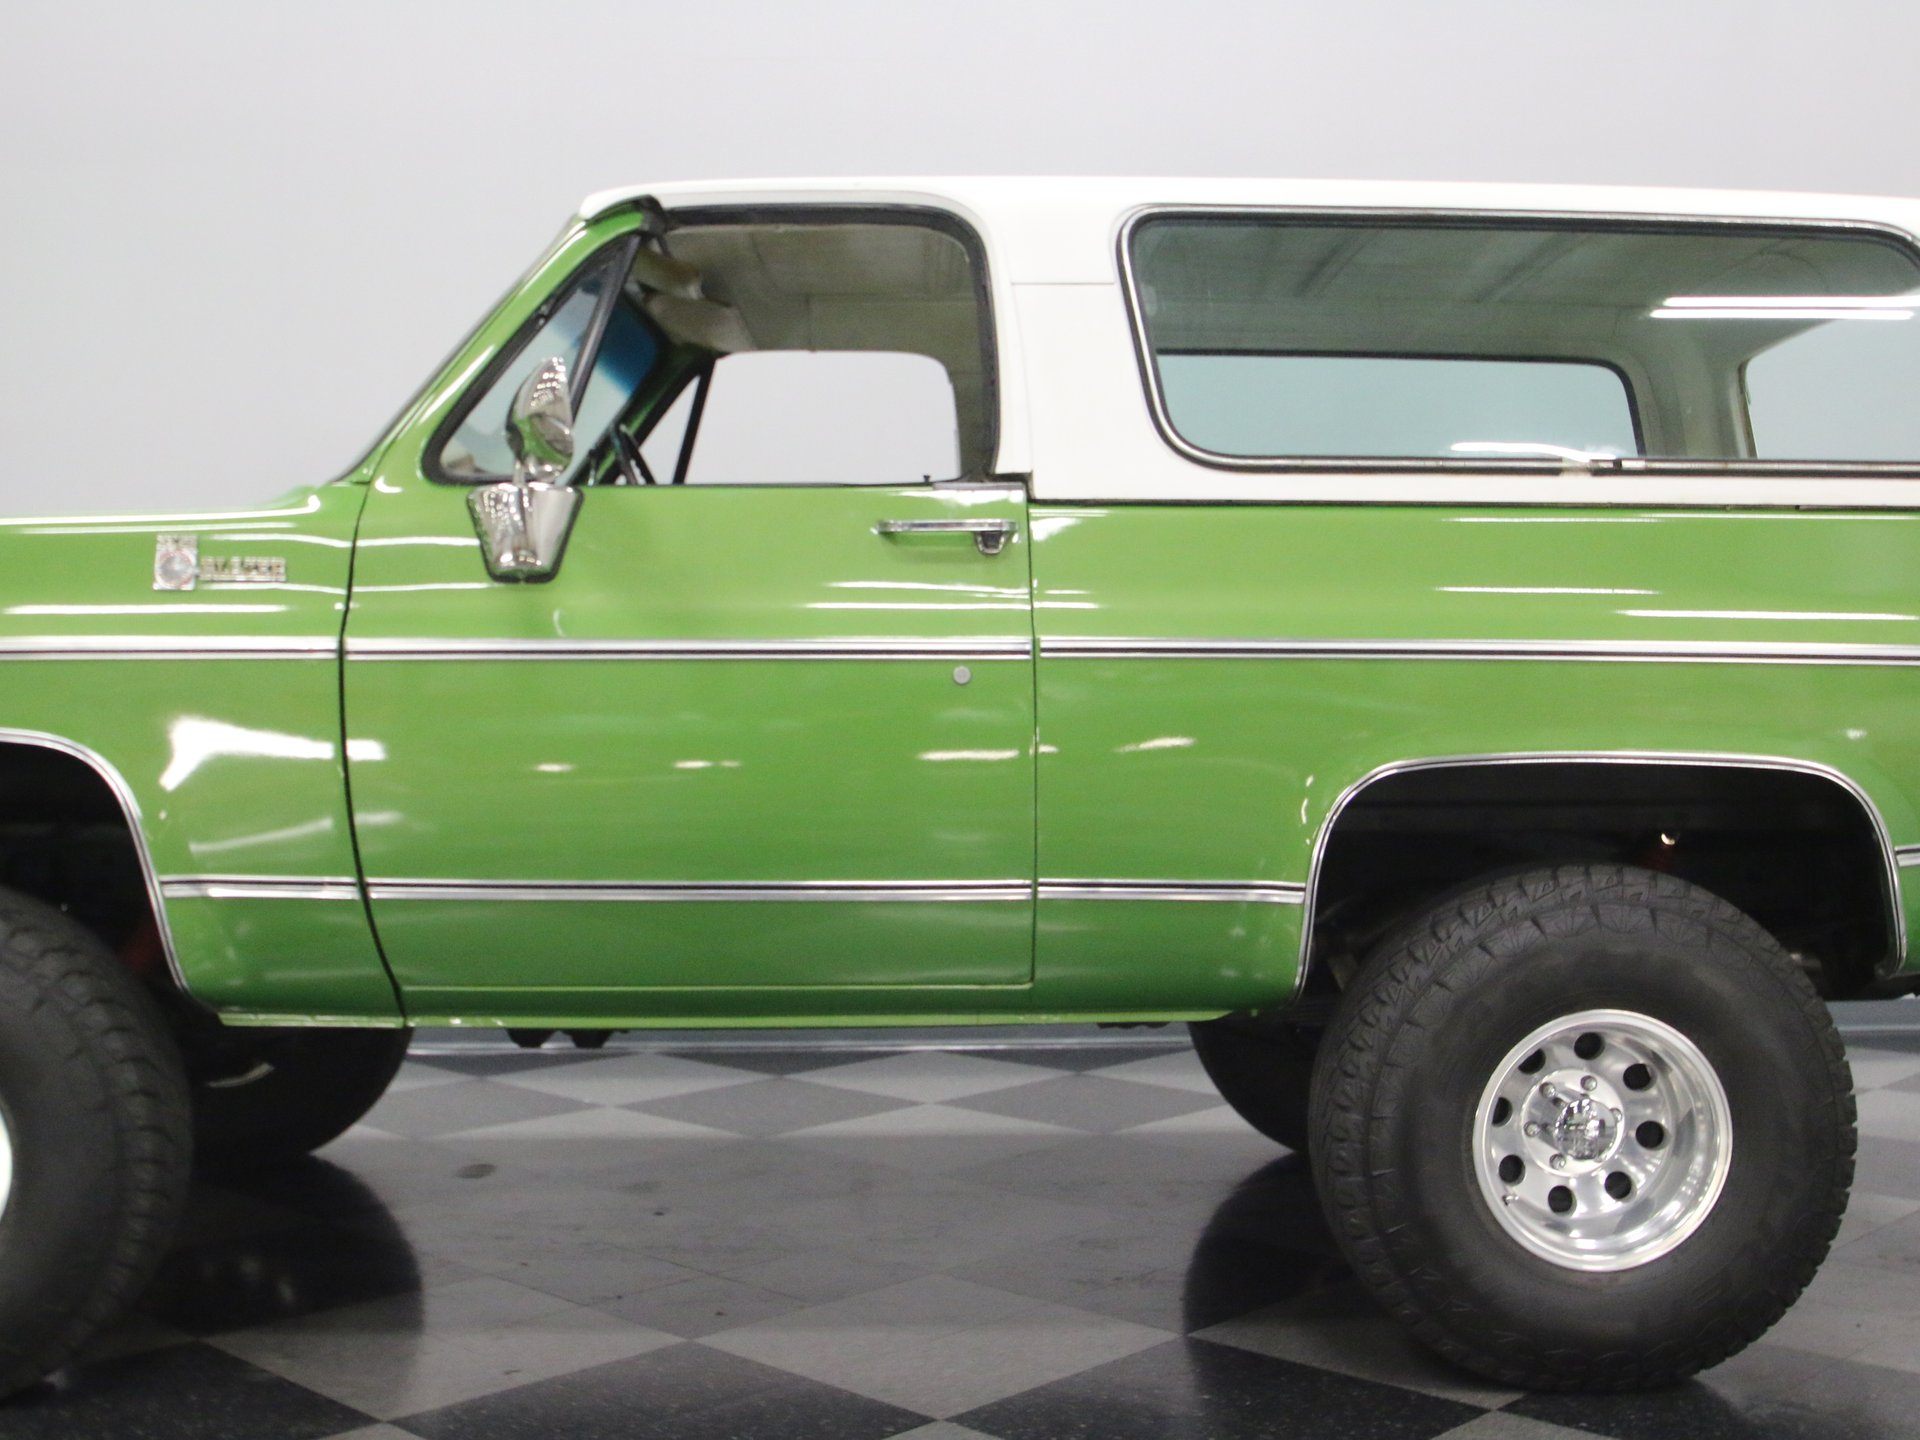 1975 Chevrolet K5 | Streetside Classics - The Nation's